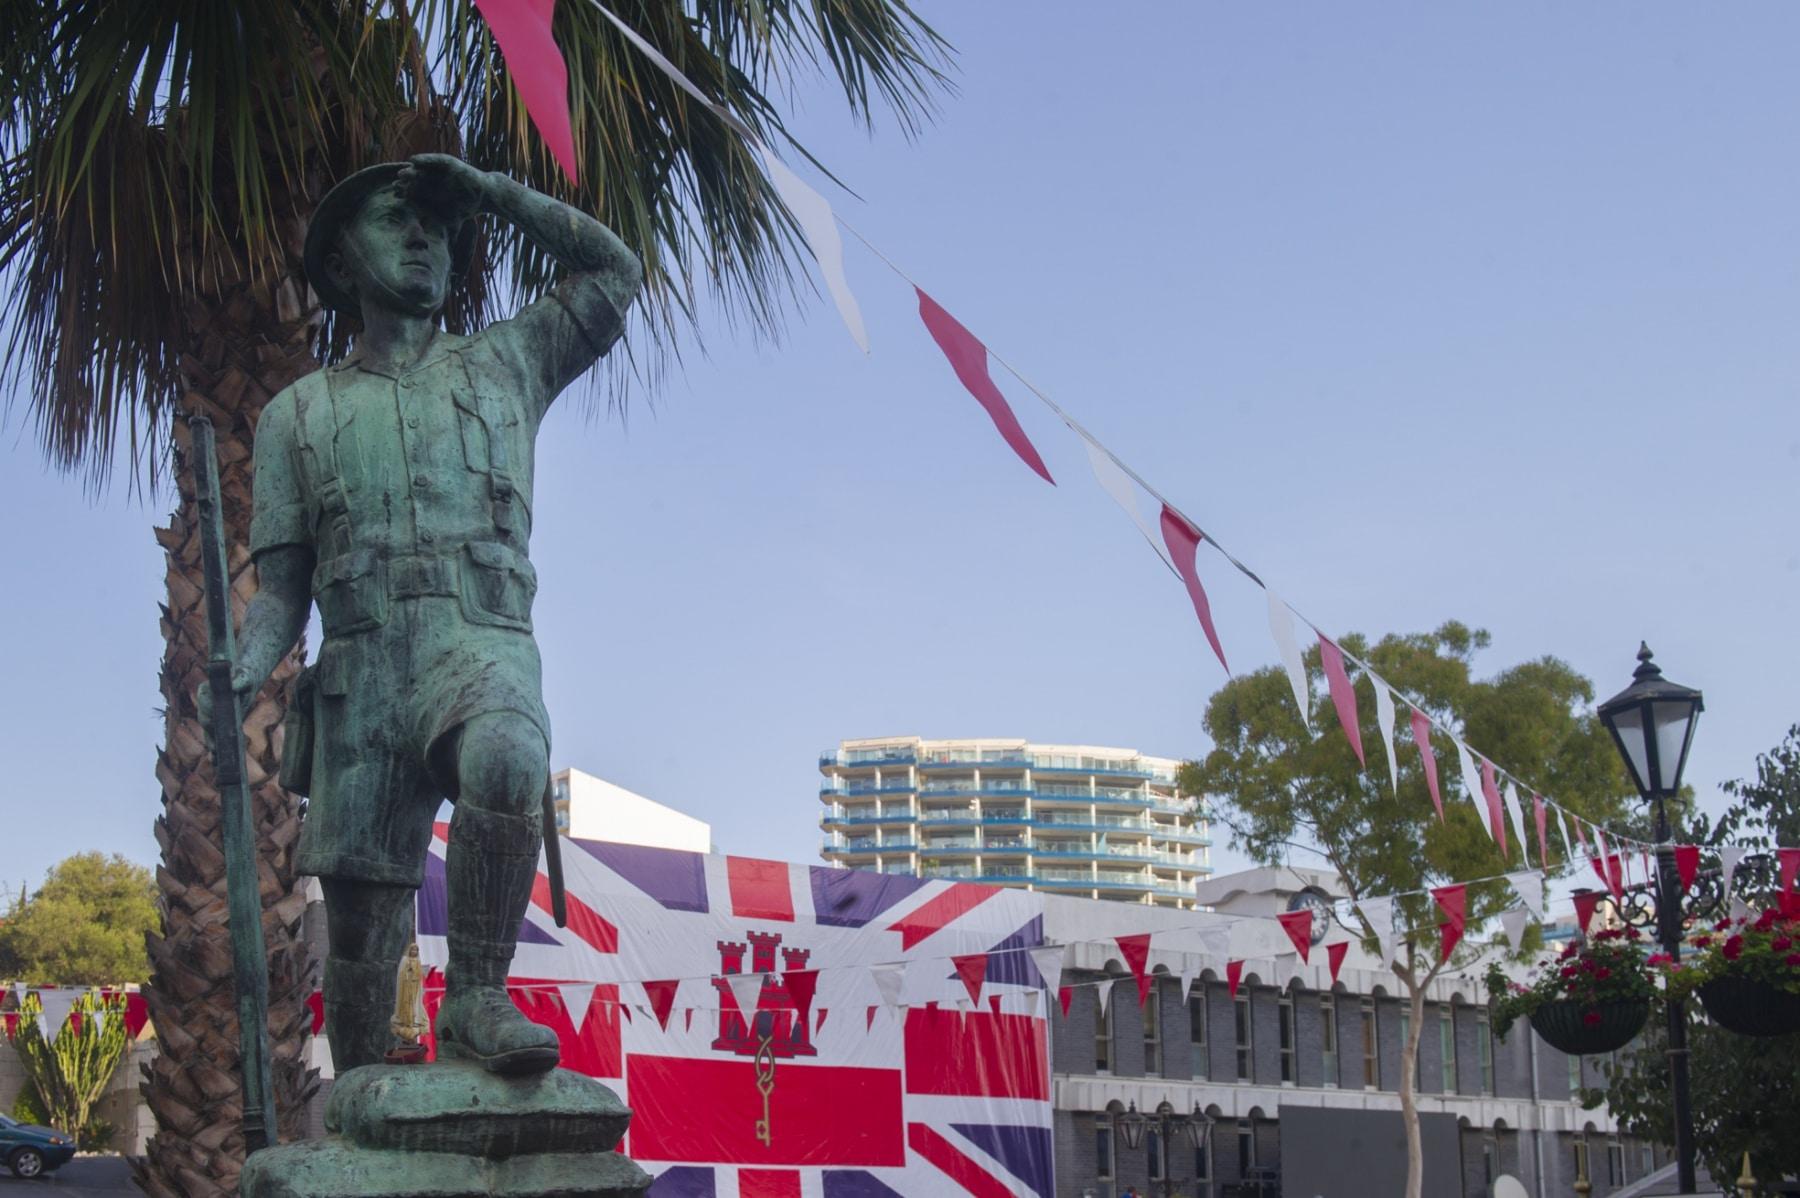 monumento-situado-en-la-plaza-de-casemates-en-gibraltar-en-honor-a-los-gibraltareos-que-participaron-como-voluntarios-en-la-ii-guerra-mundial_22714410926_o